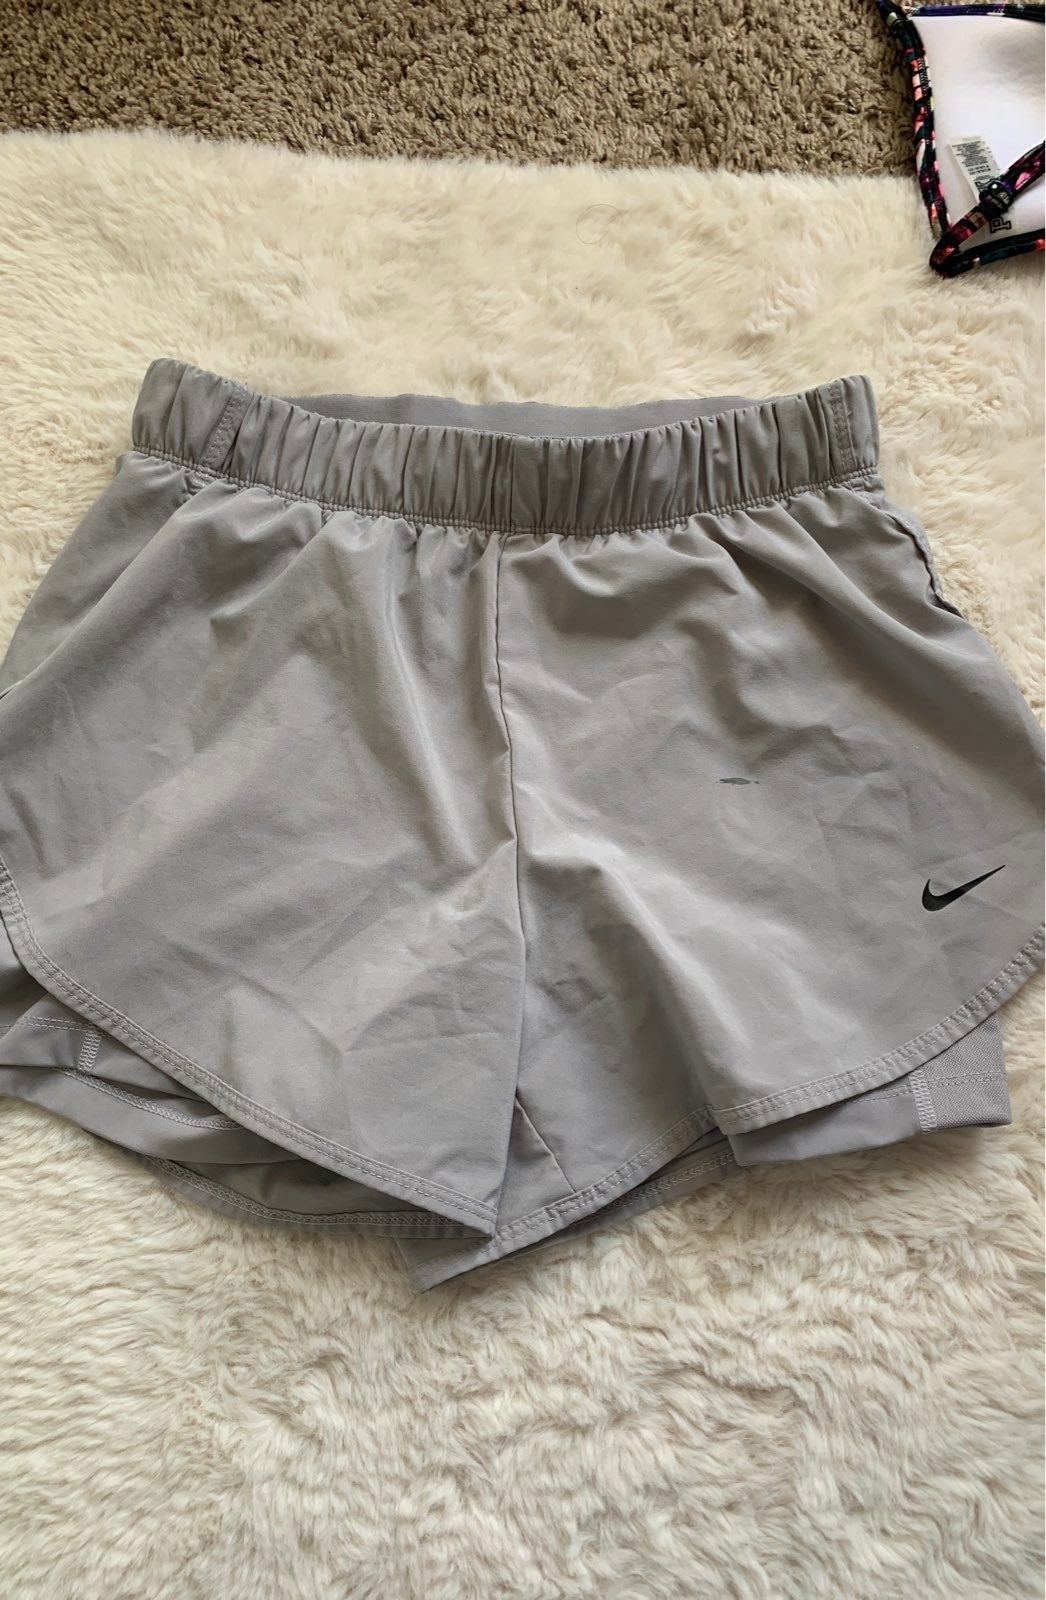 Nike Dri-FIT Shorts in Cool Grey